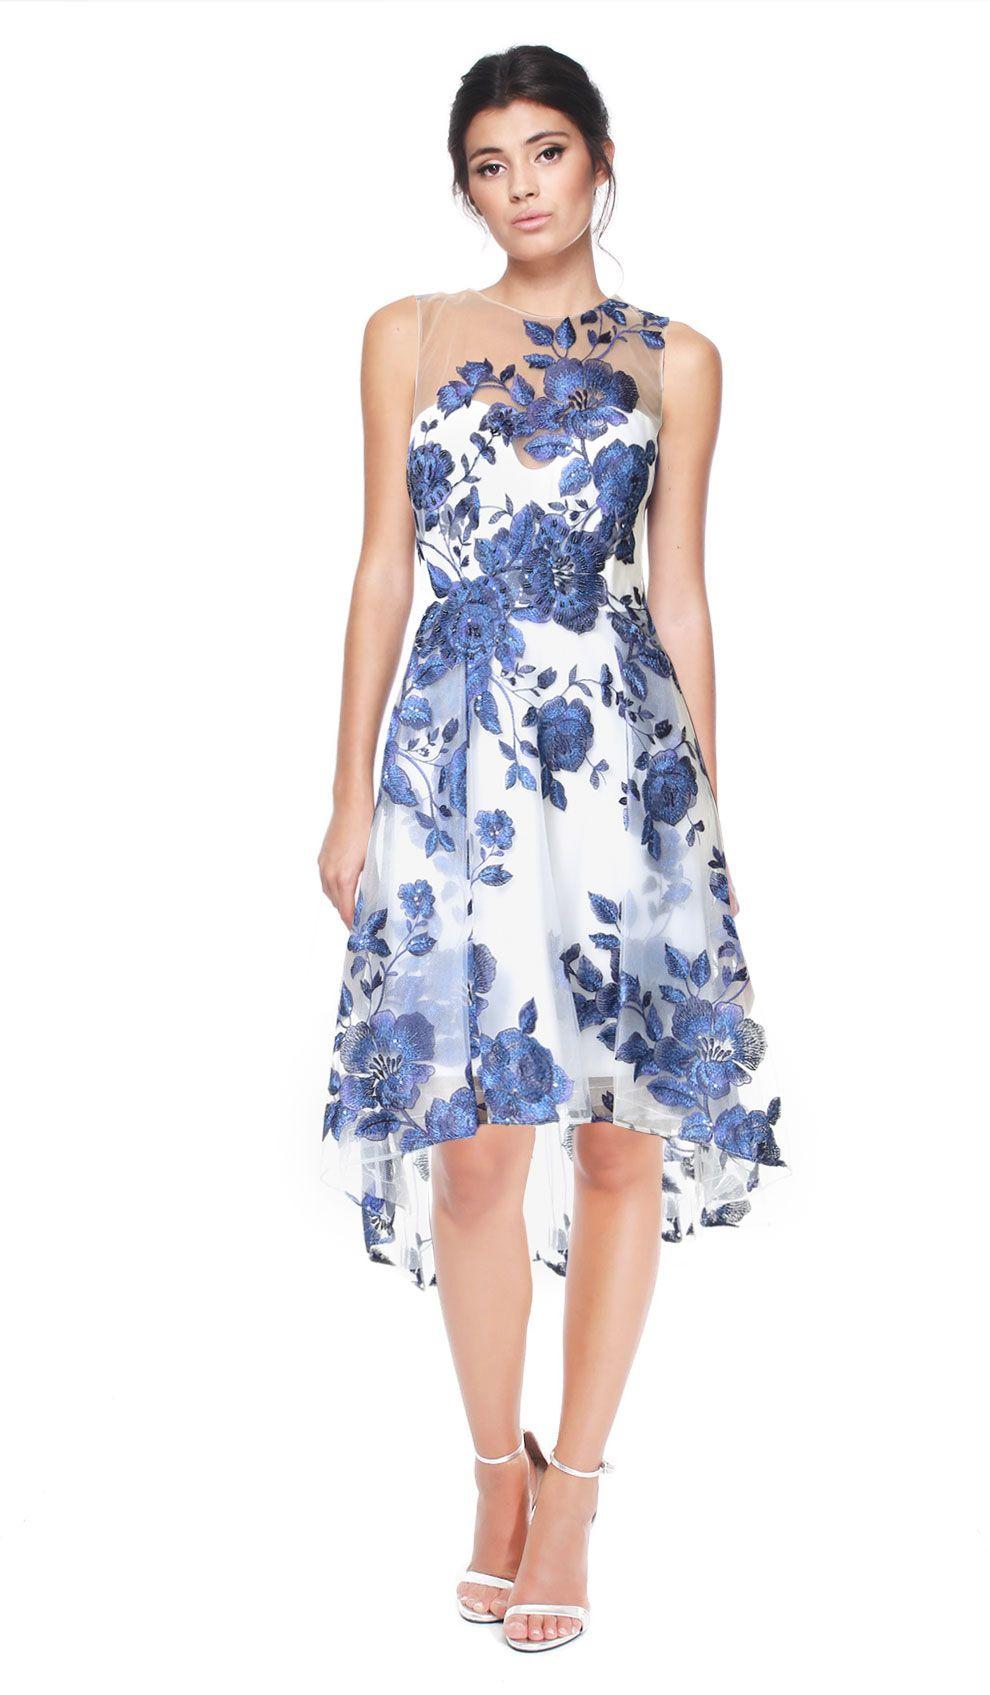 Evening Dress for Rent